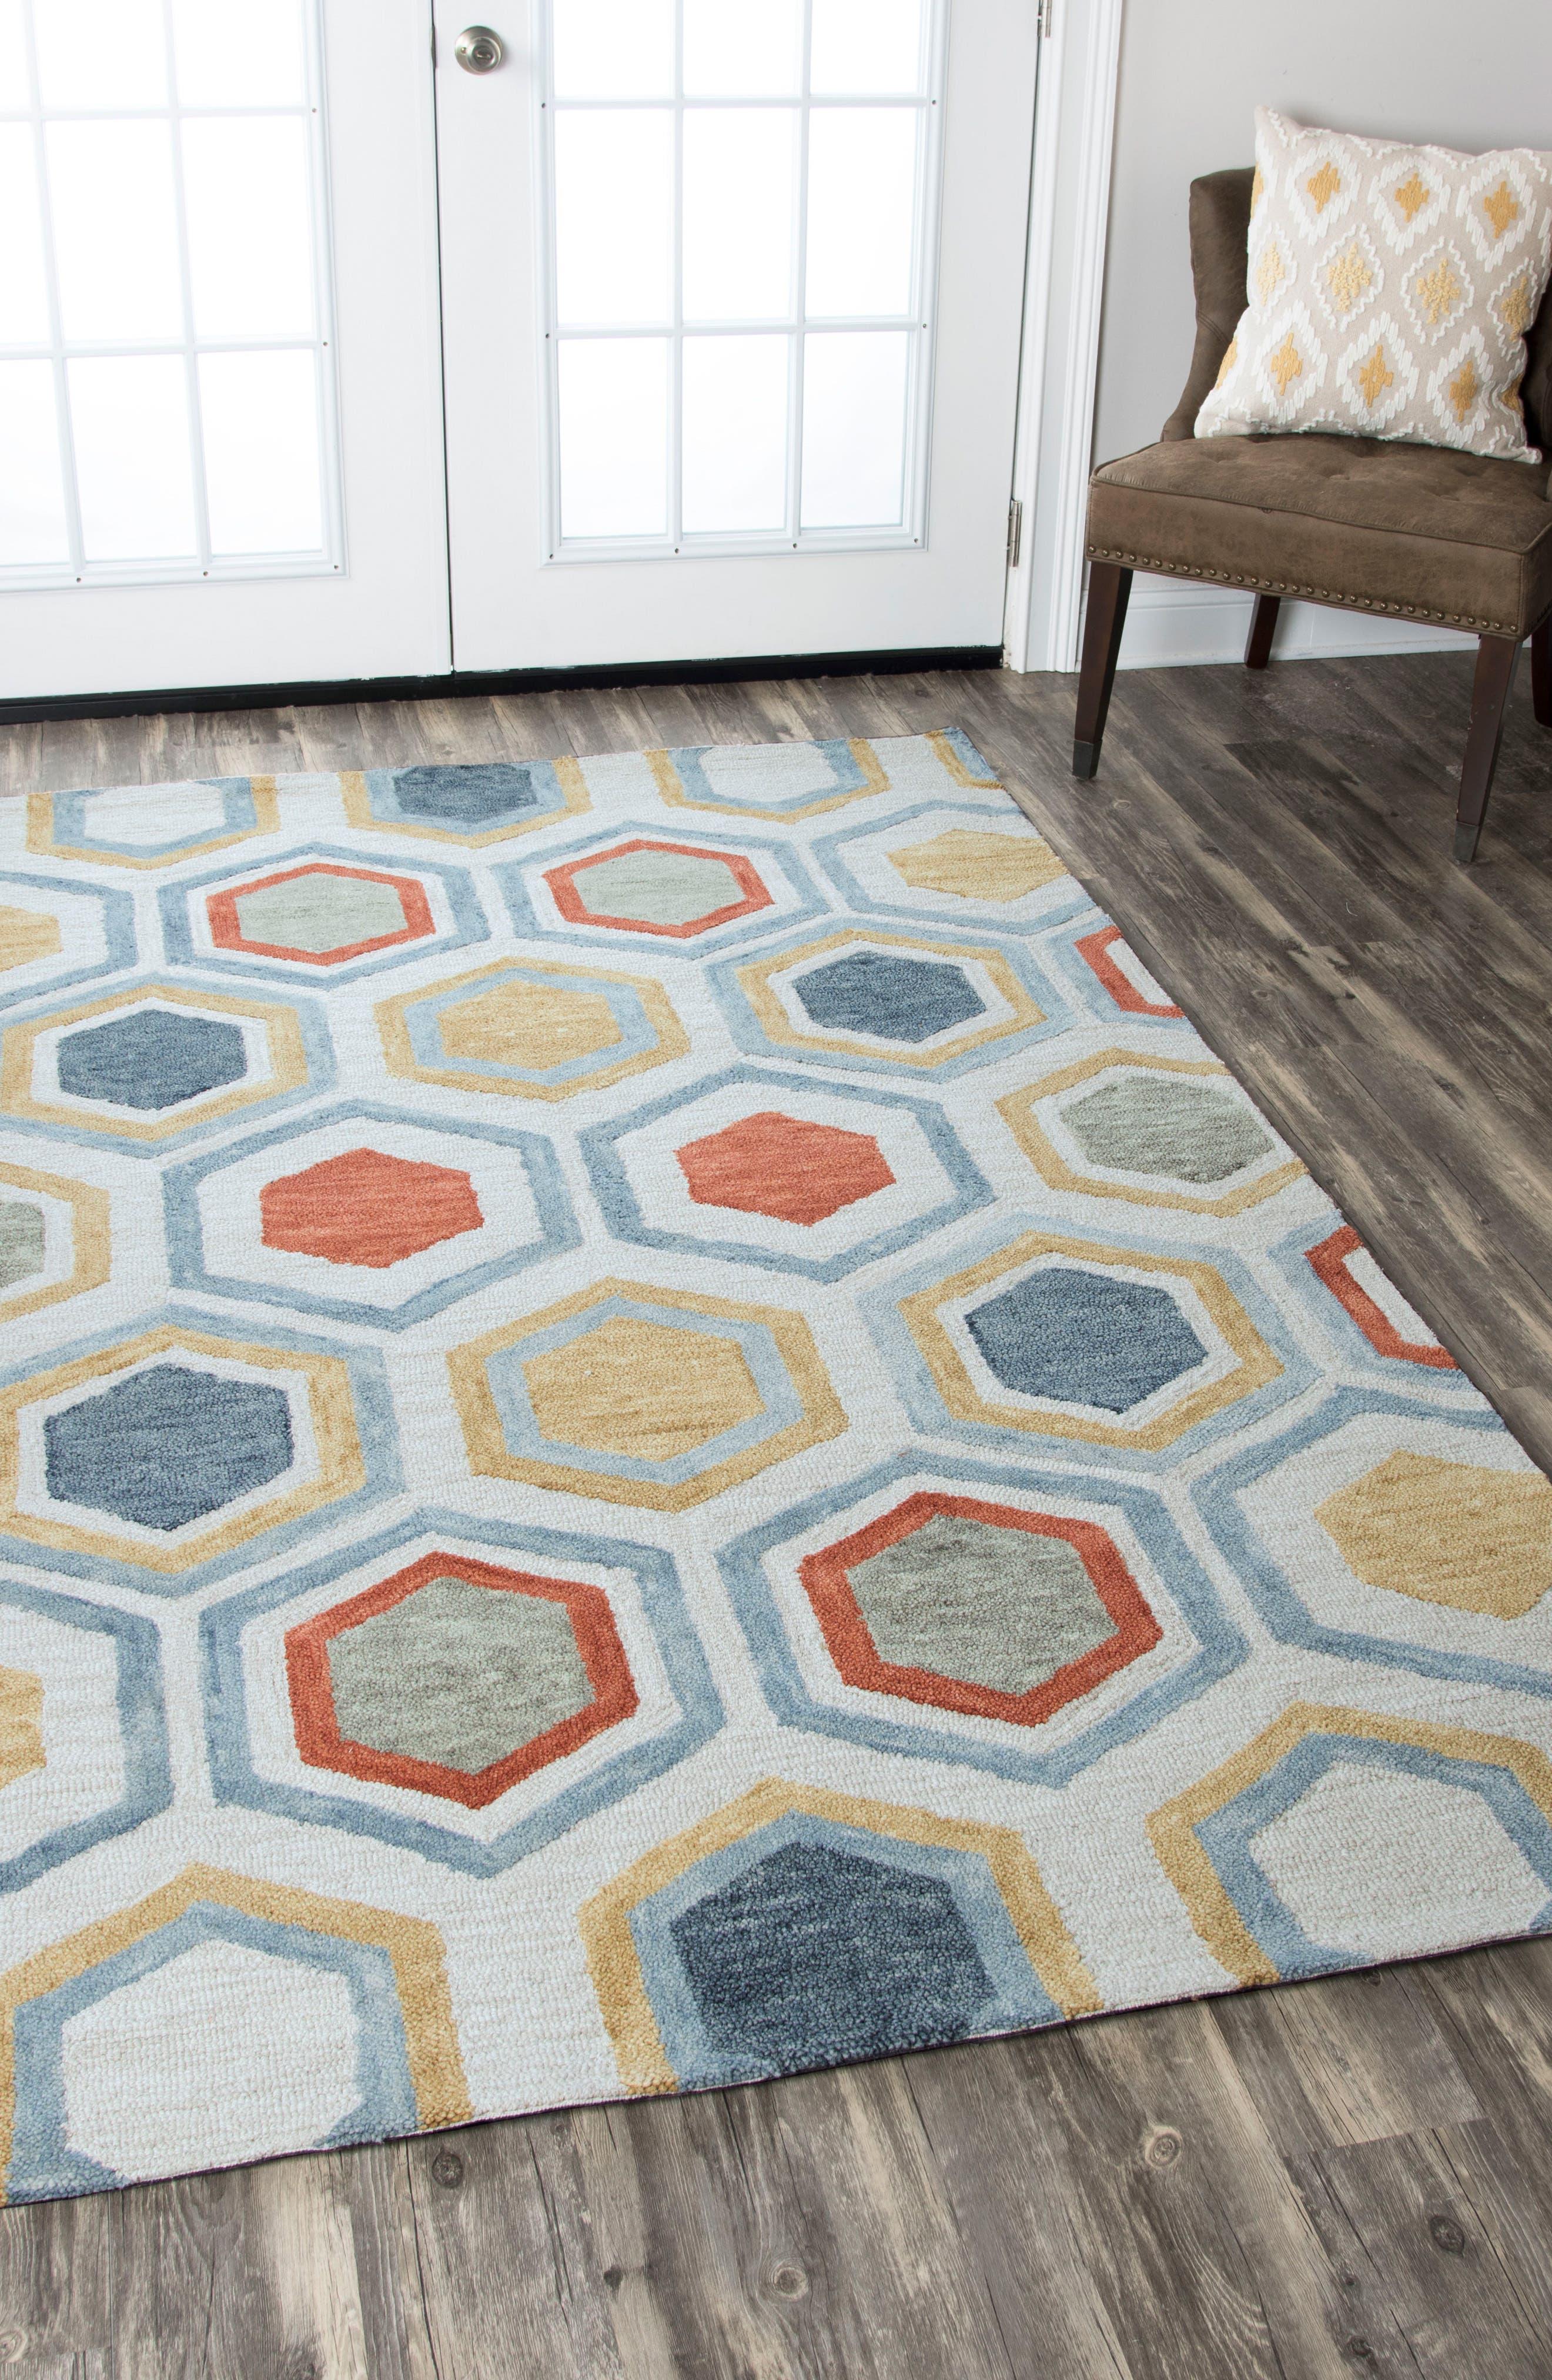 'Lancaster Geometric' Hand Tufted Wool Area Rug,                             Alternate thumbnail 2, color,                             020